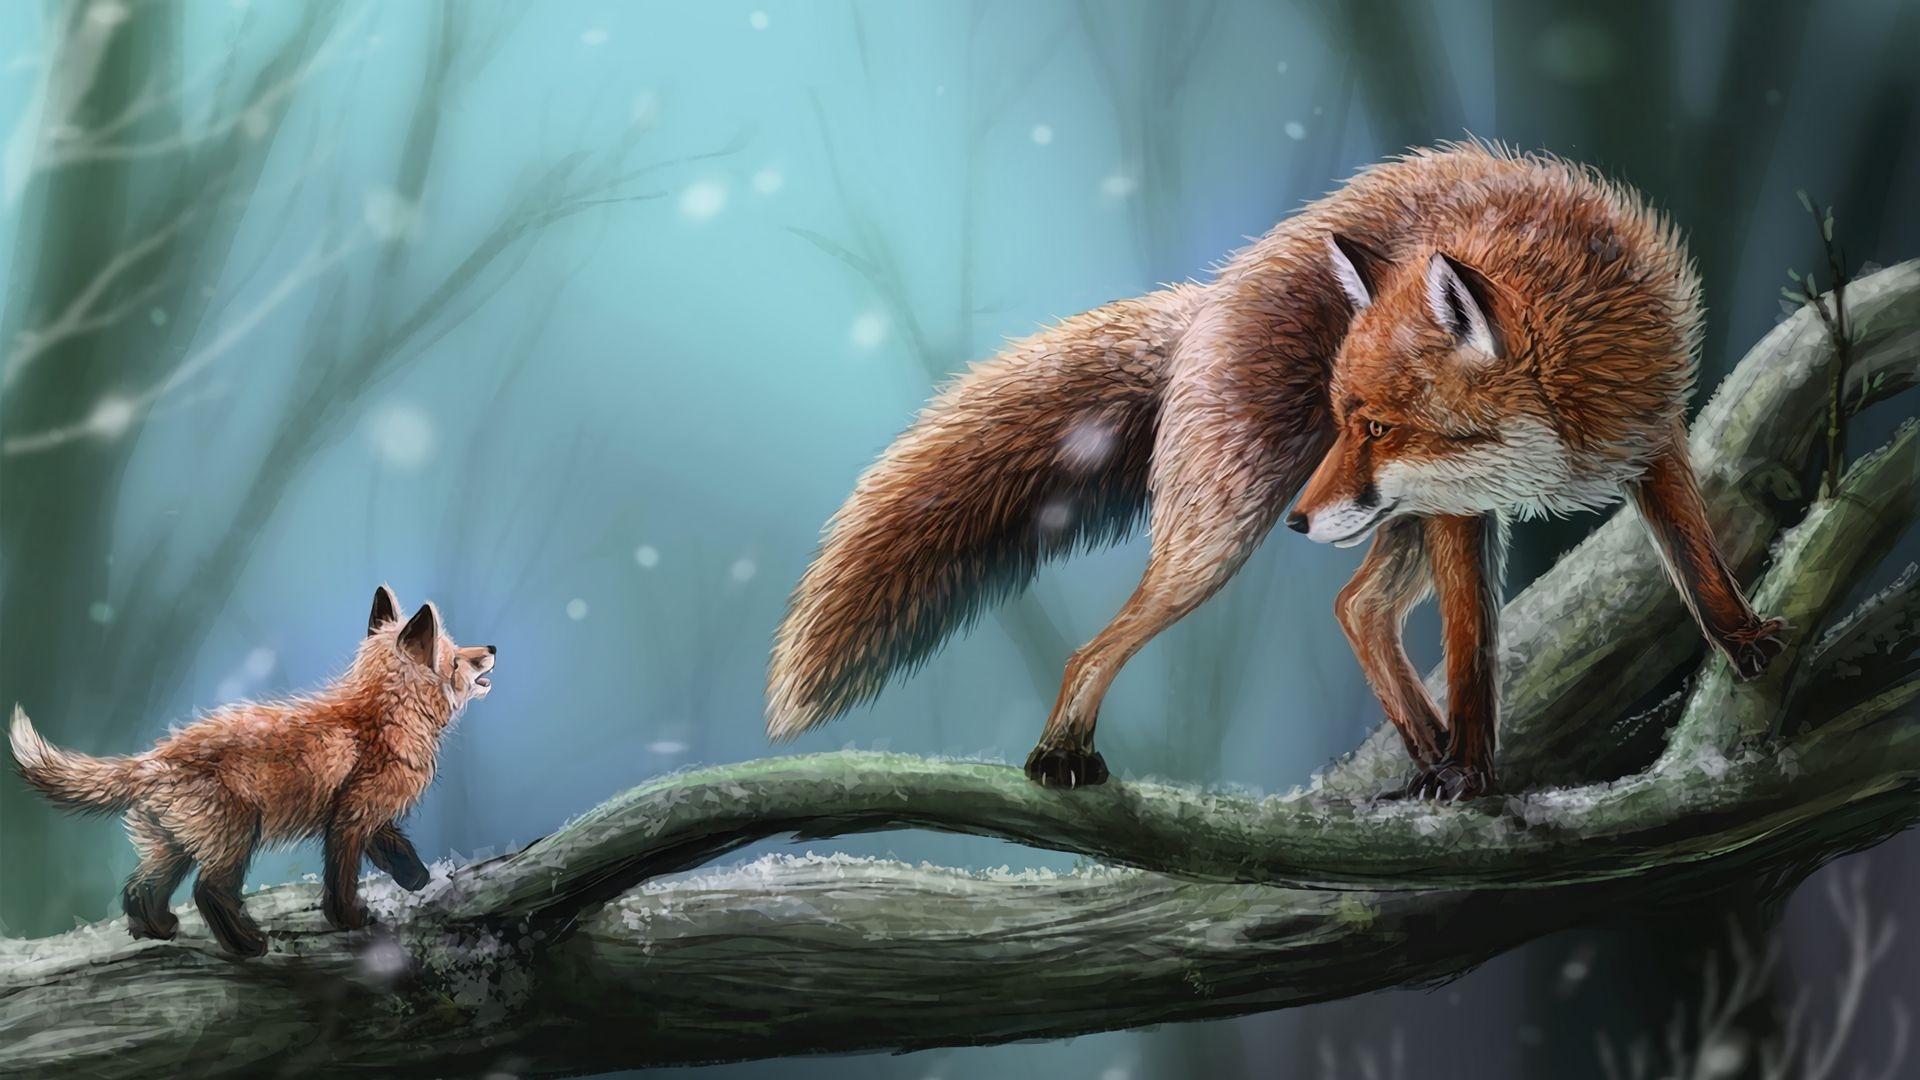 Fox Art HD Wallpaper